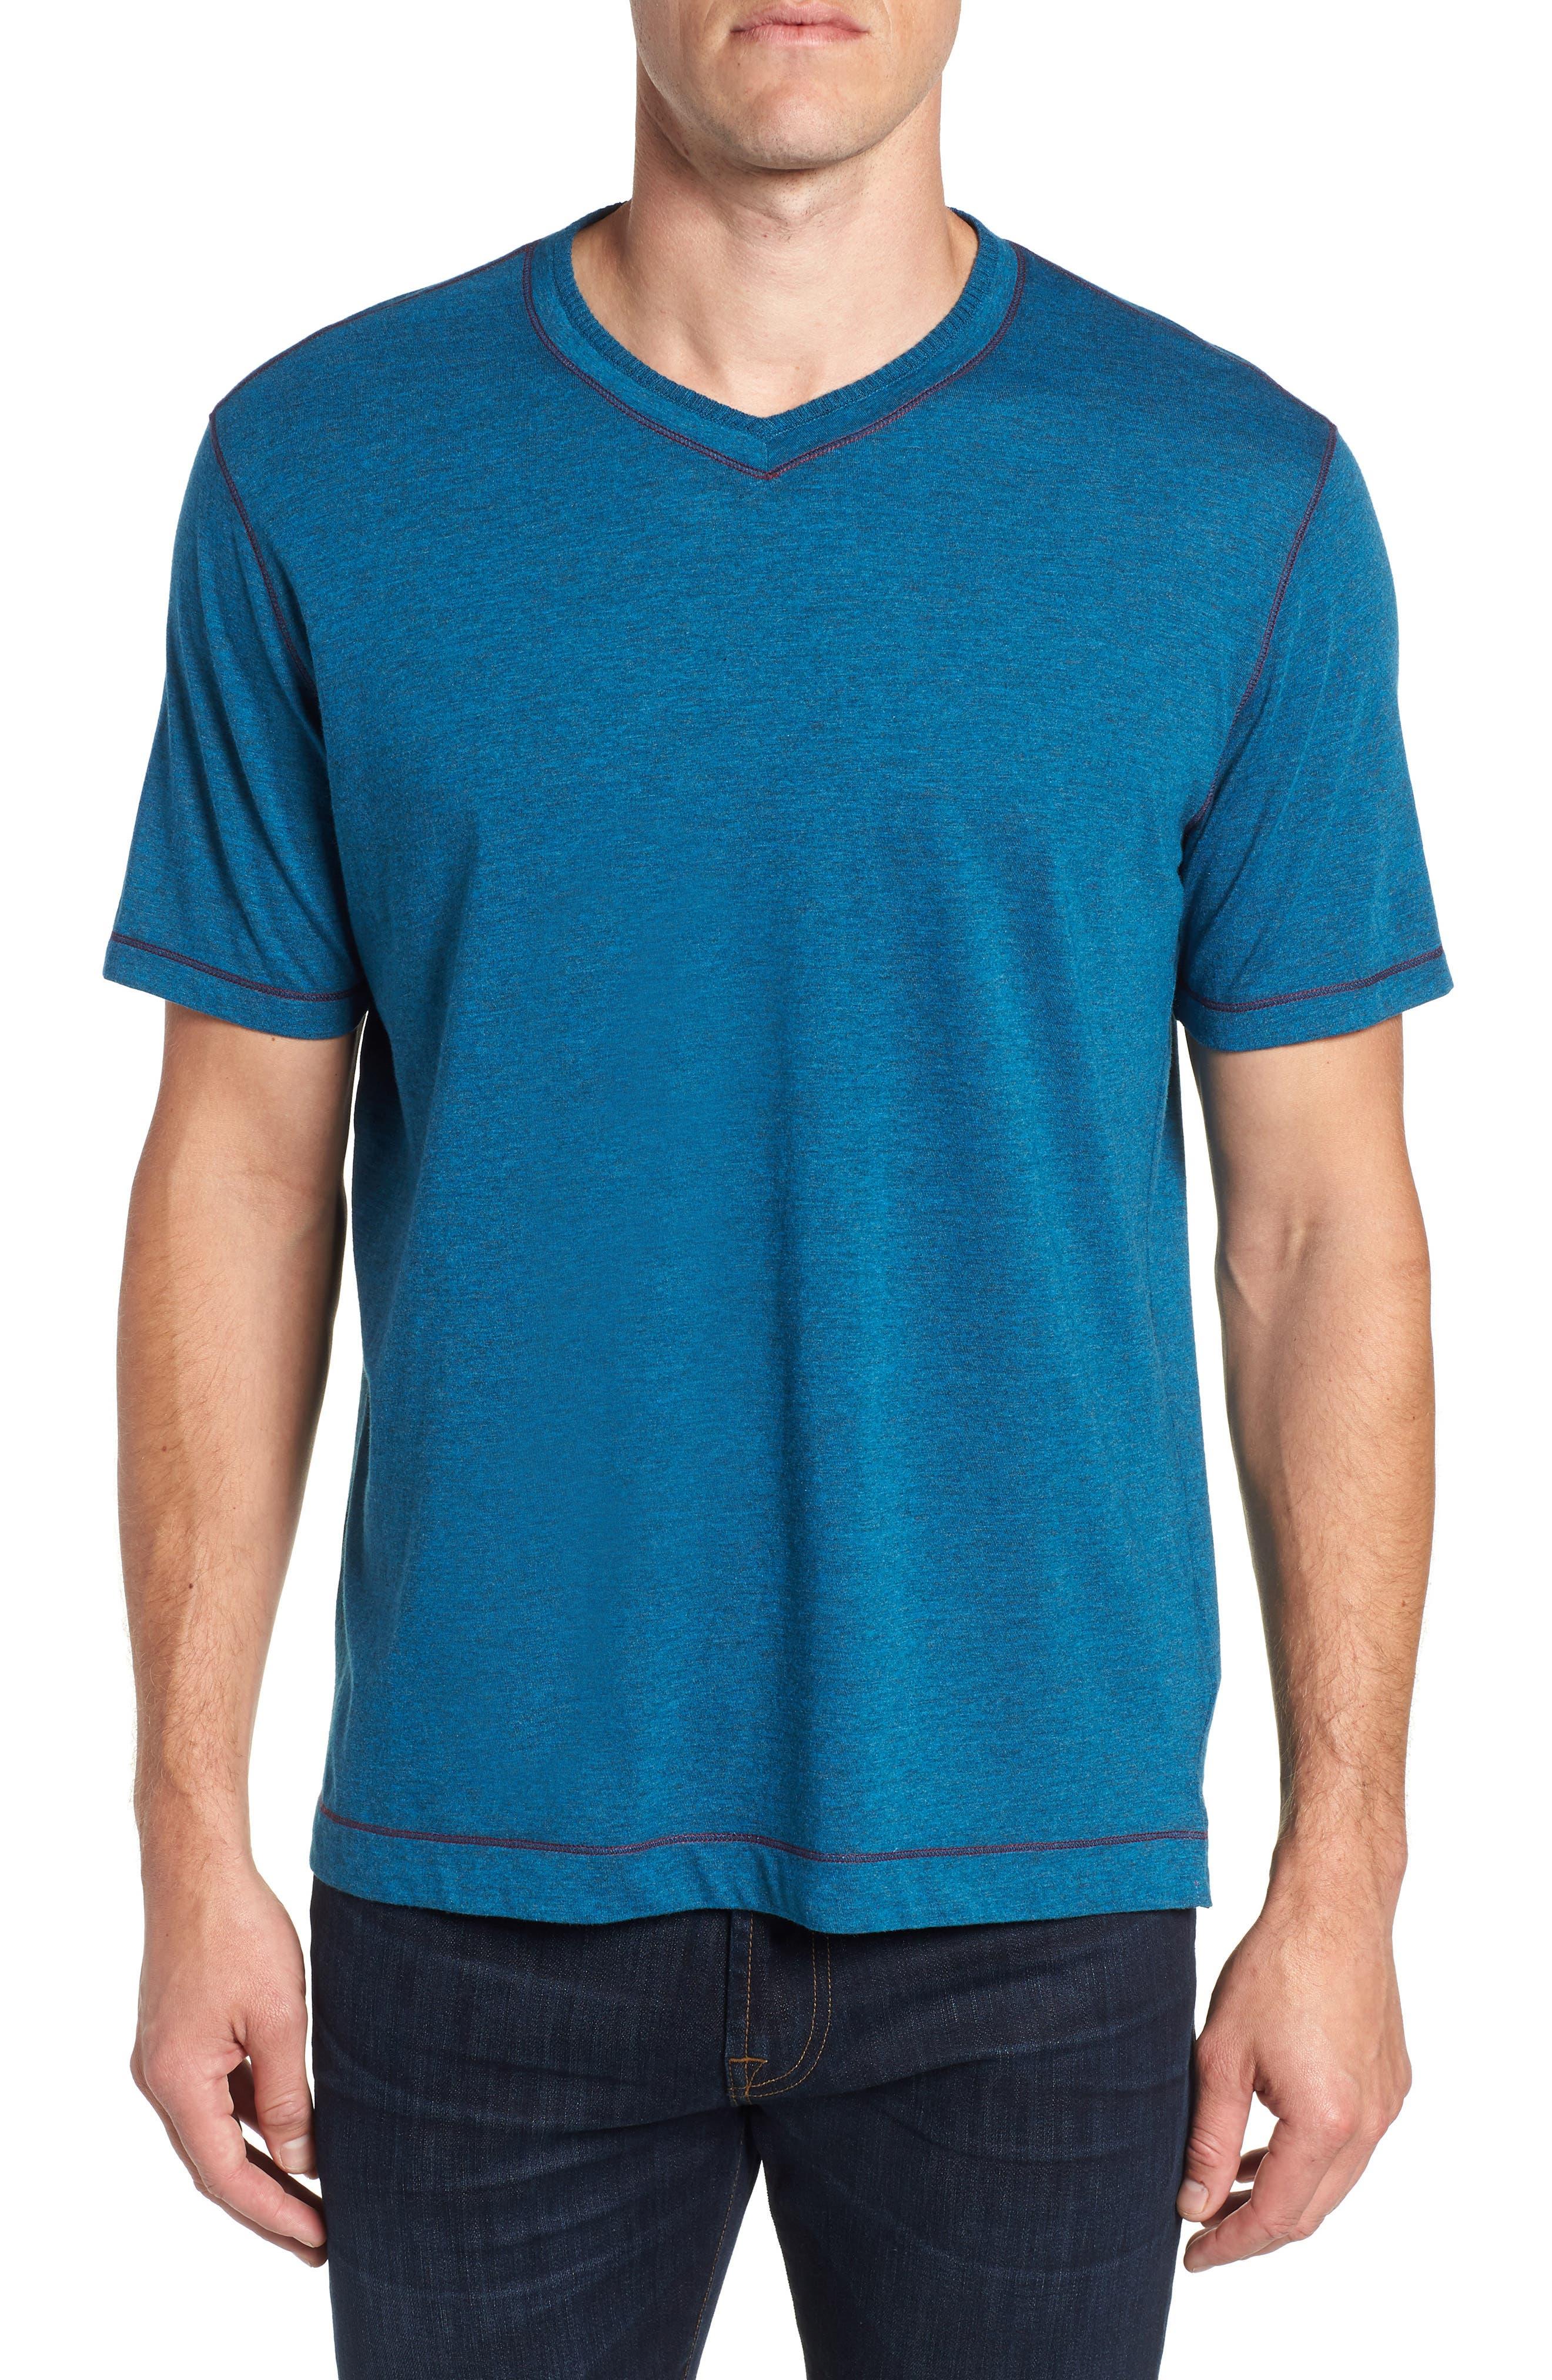 Traveler V-Neck T-Shirt,                             Main thumbnail 1, color,                             DARK TEAL